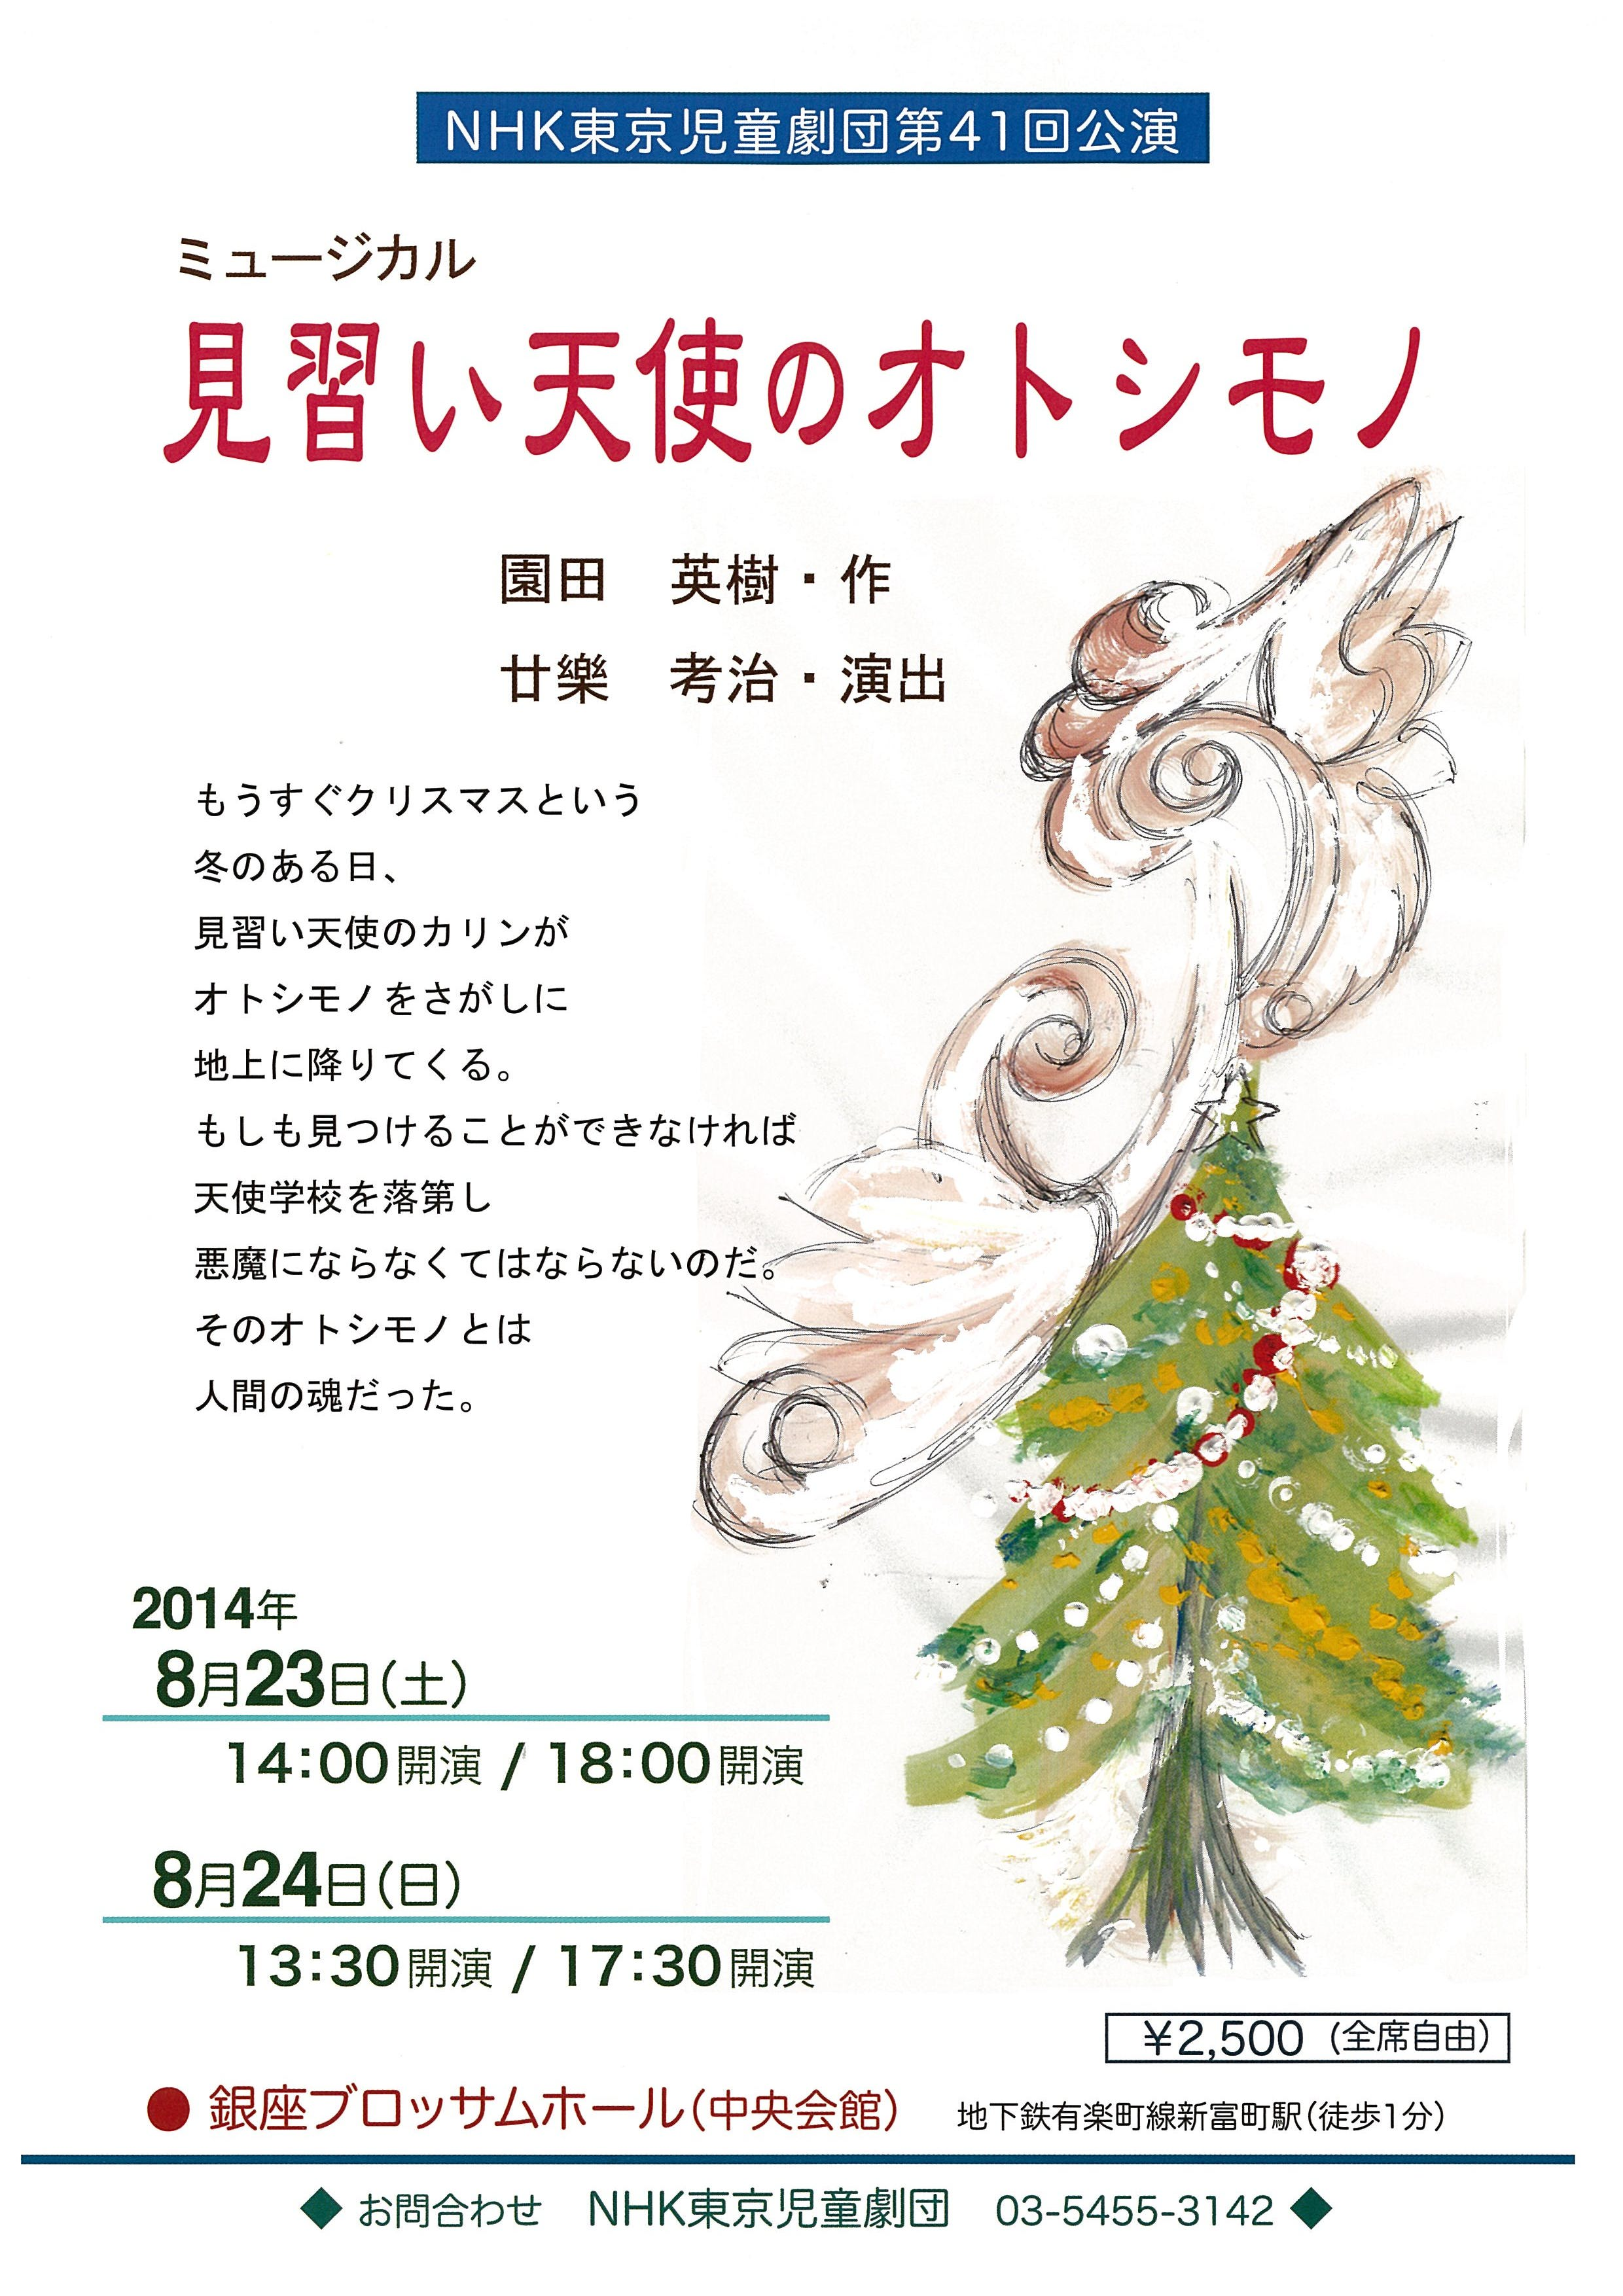 NHK東京児童劇団「見習い天使のオトシモノ」